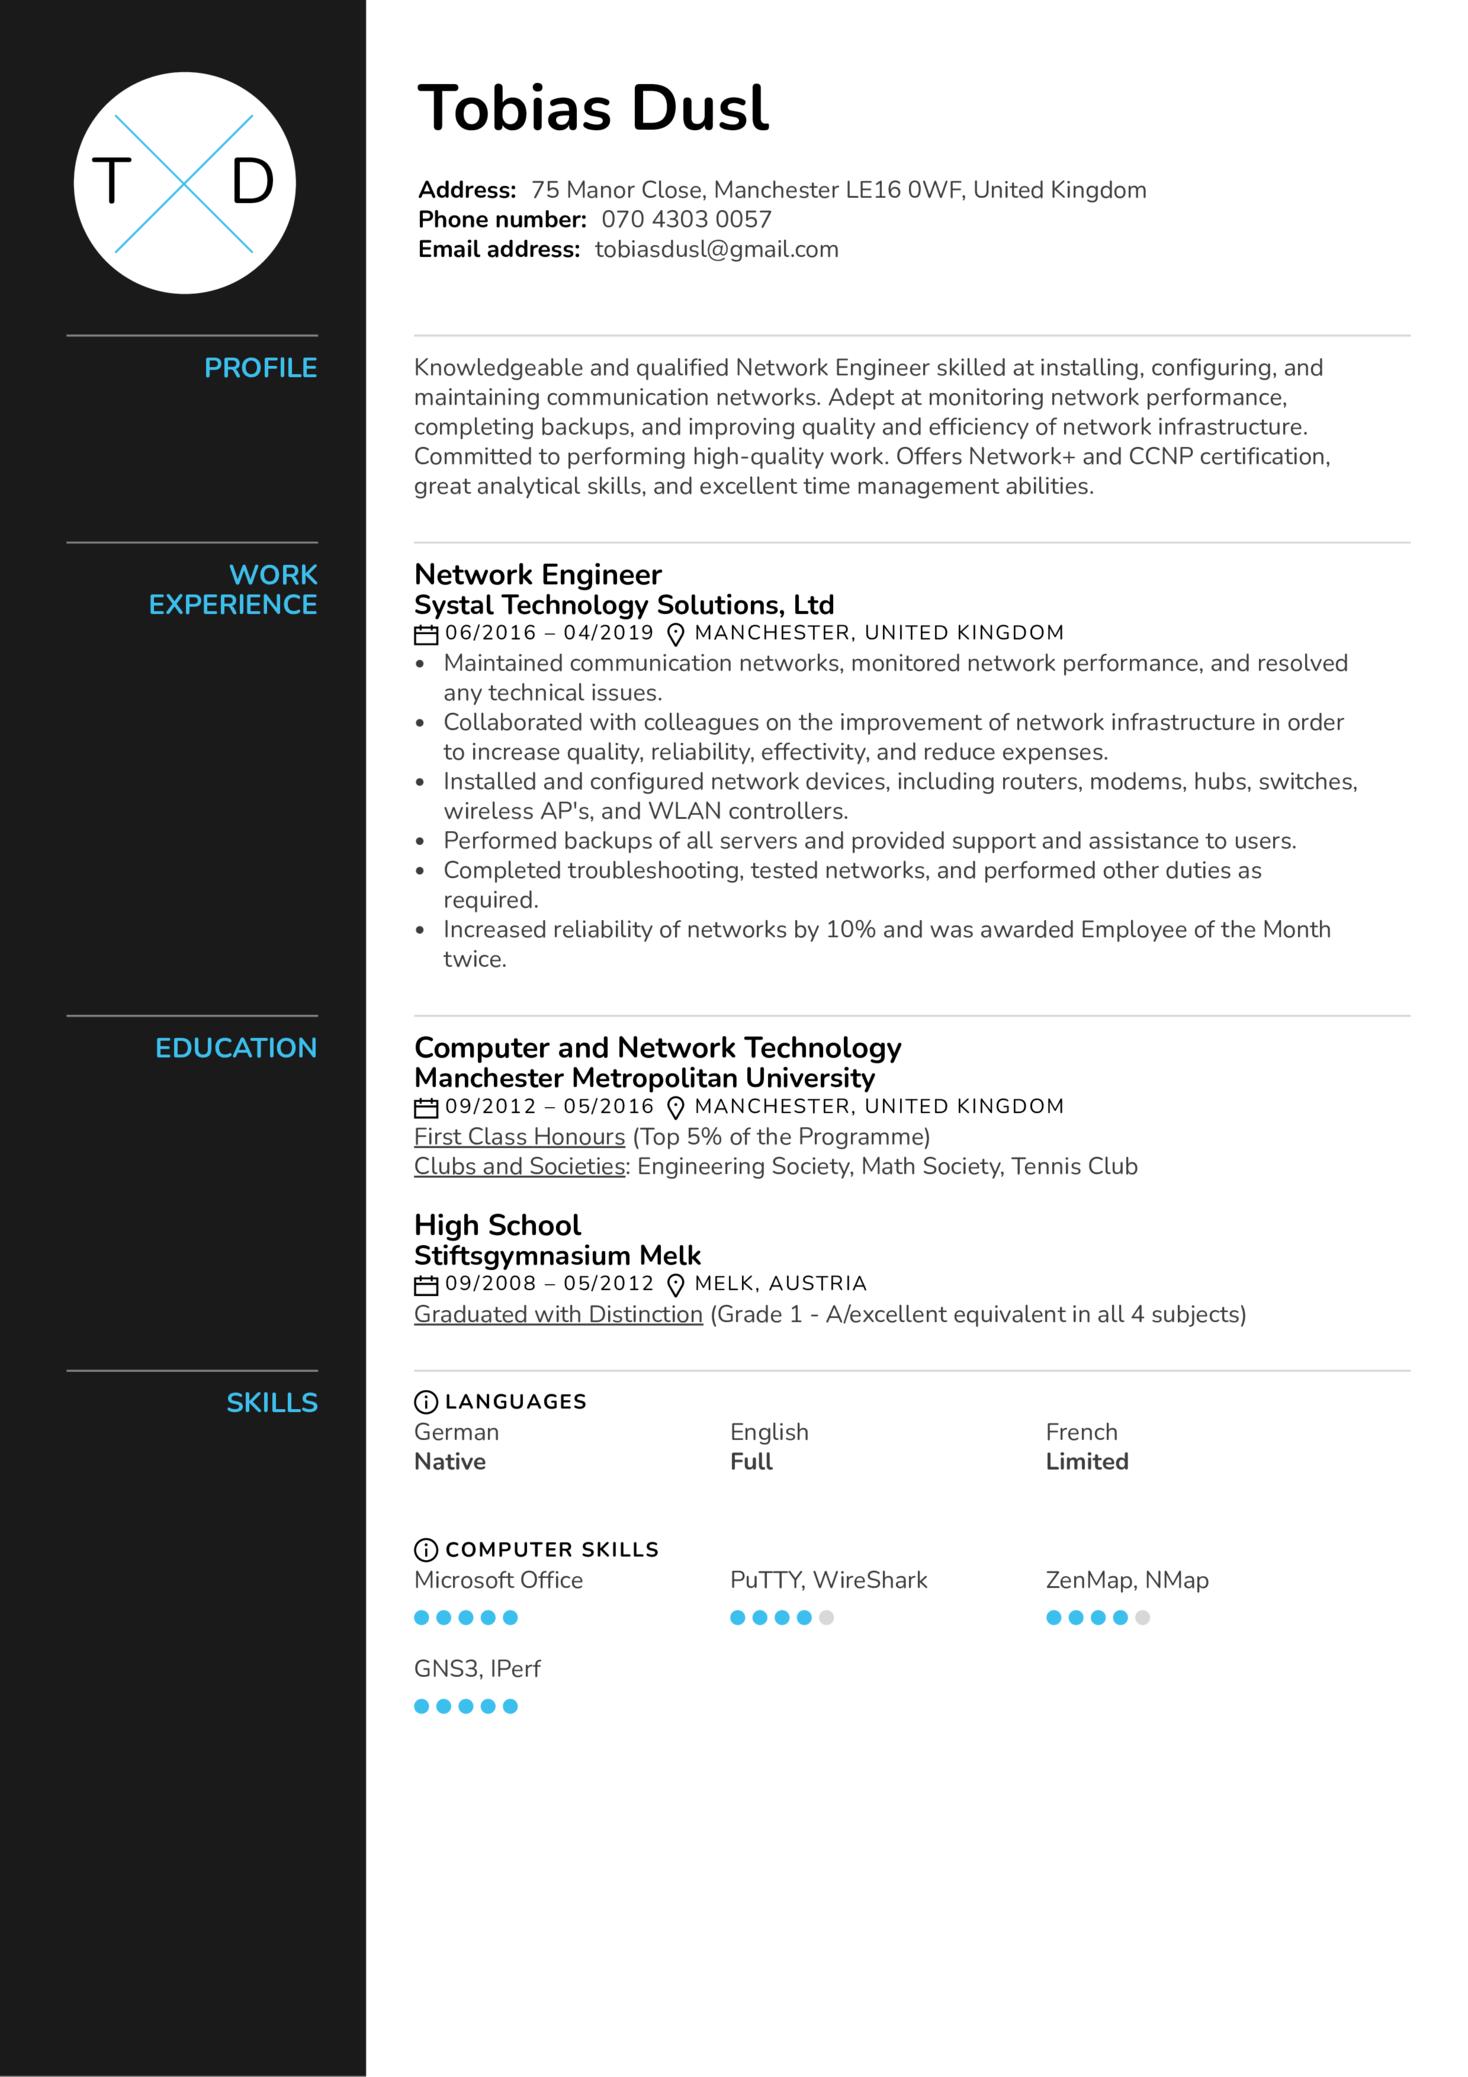 Network Engineer Resume Sample (časť 1)